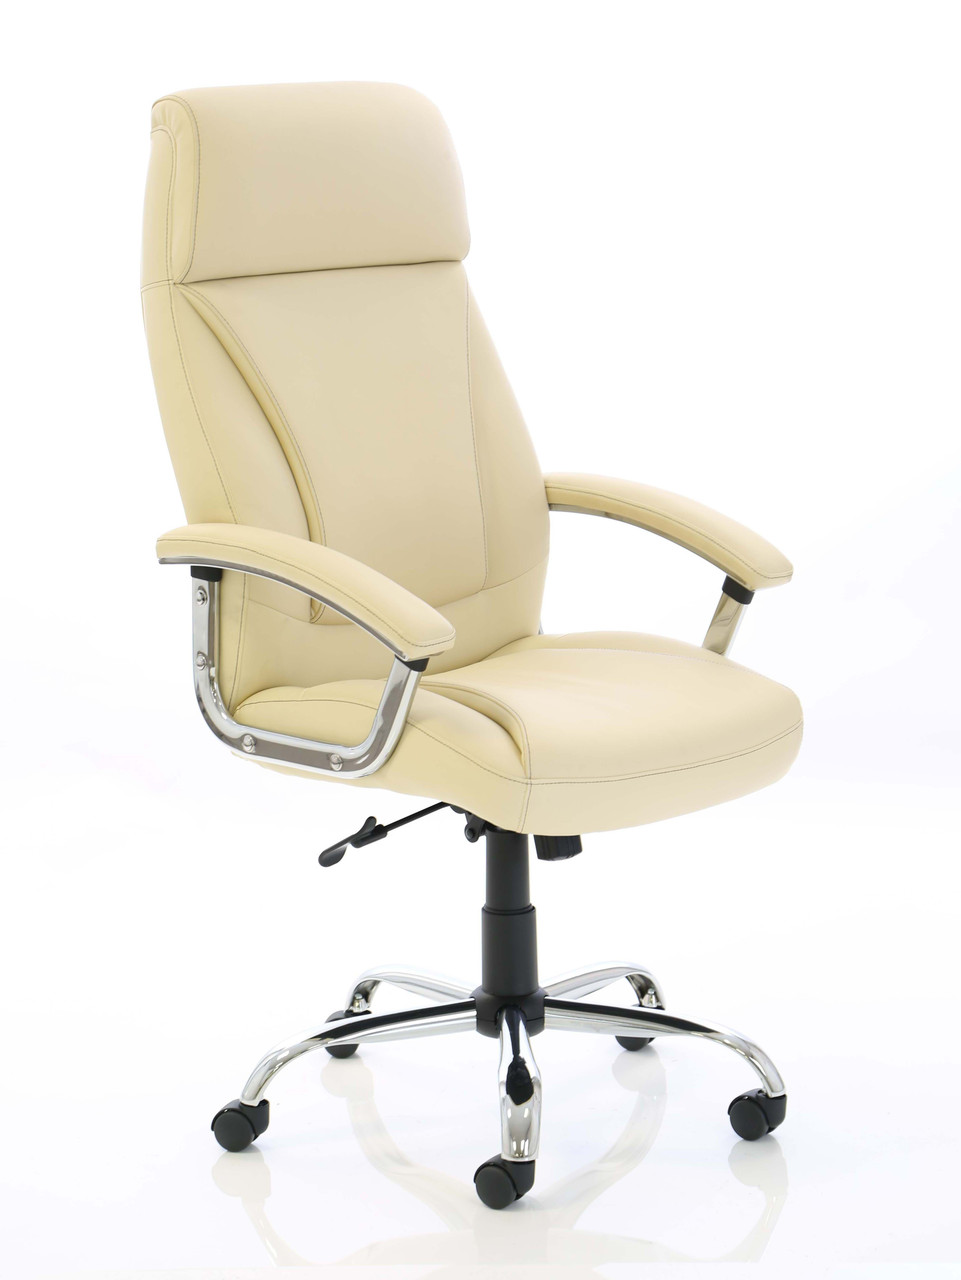 Penza - Executive Cream Leather Chair